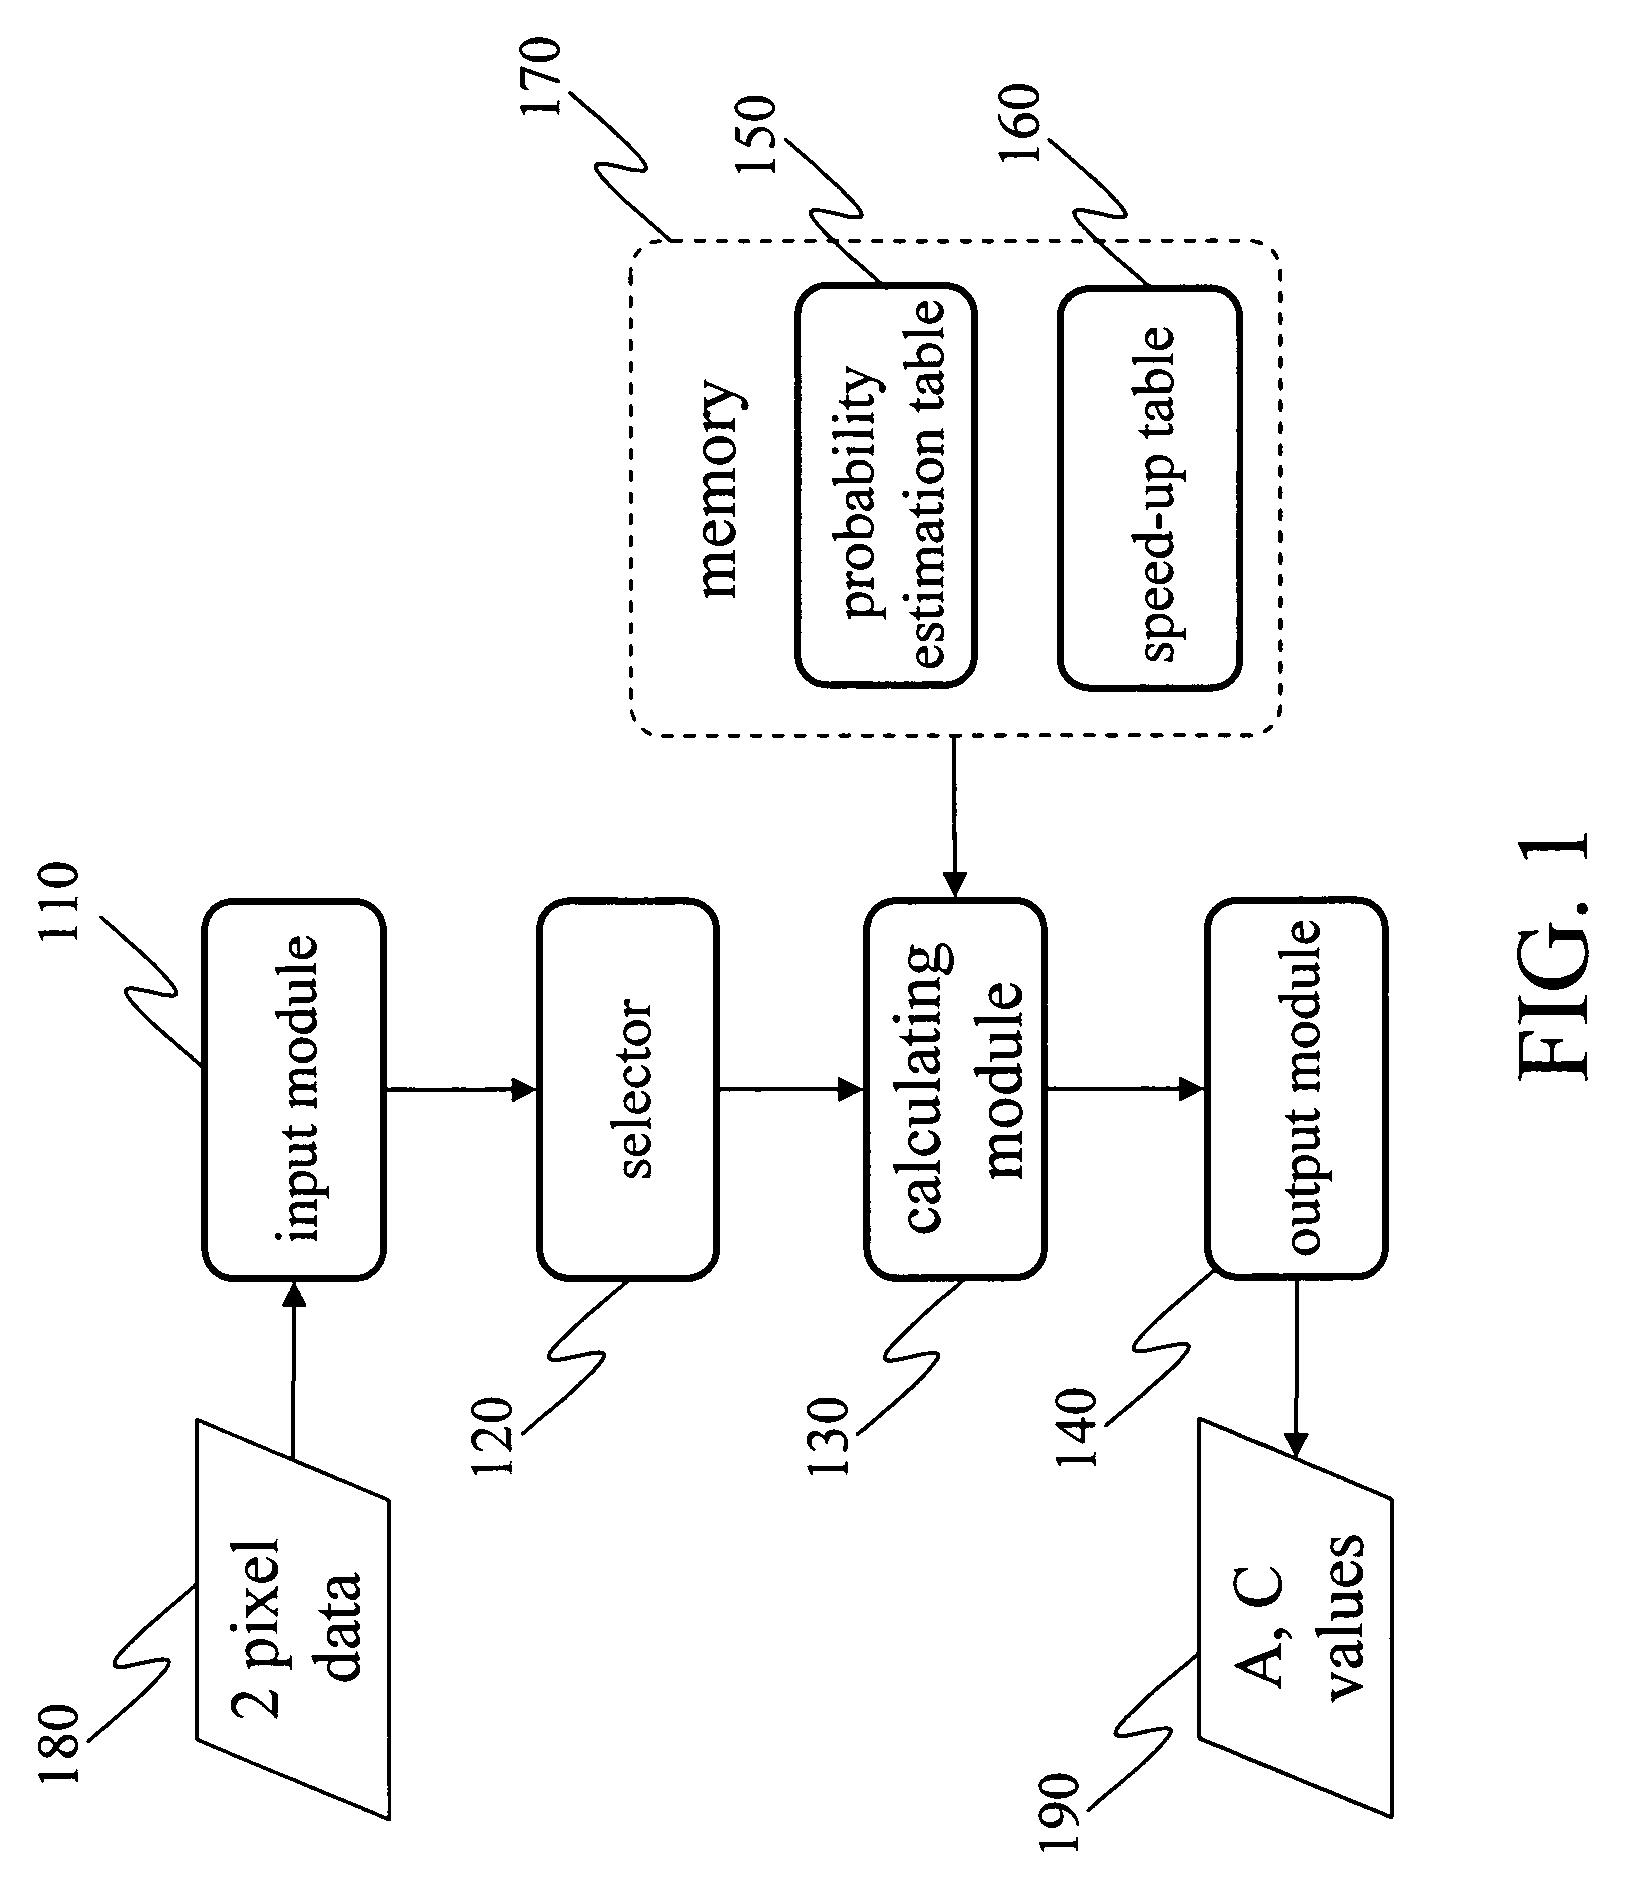 hight resolution of 1999 nissan altima fuel pump relay wiring diagrams 1999 nissan altima wiring diagram 2003 nissan altima